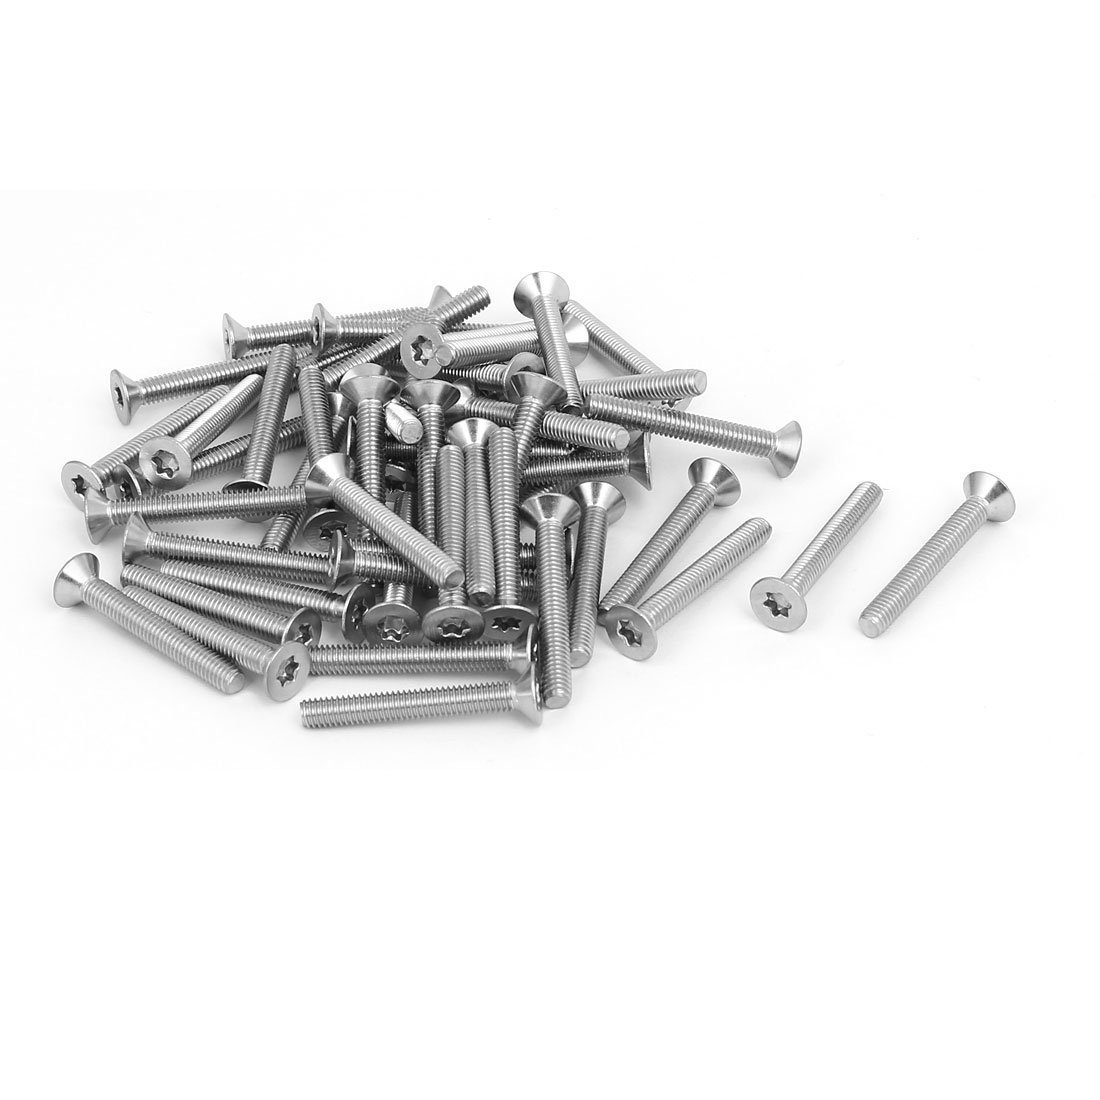 Portal Cool M4x30mm 304 Stainless Steel Flat Countersunk Head Torx Screws Silver Tone 50pcs Wide Spread